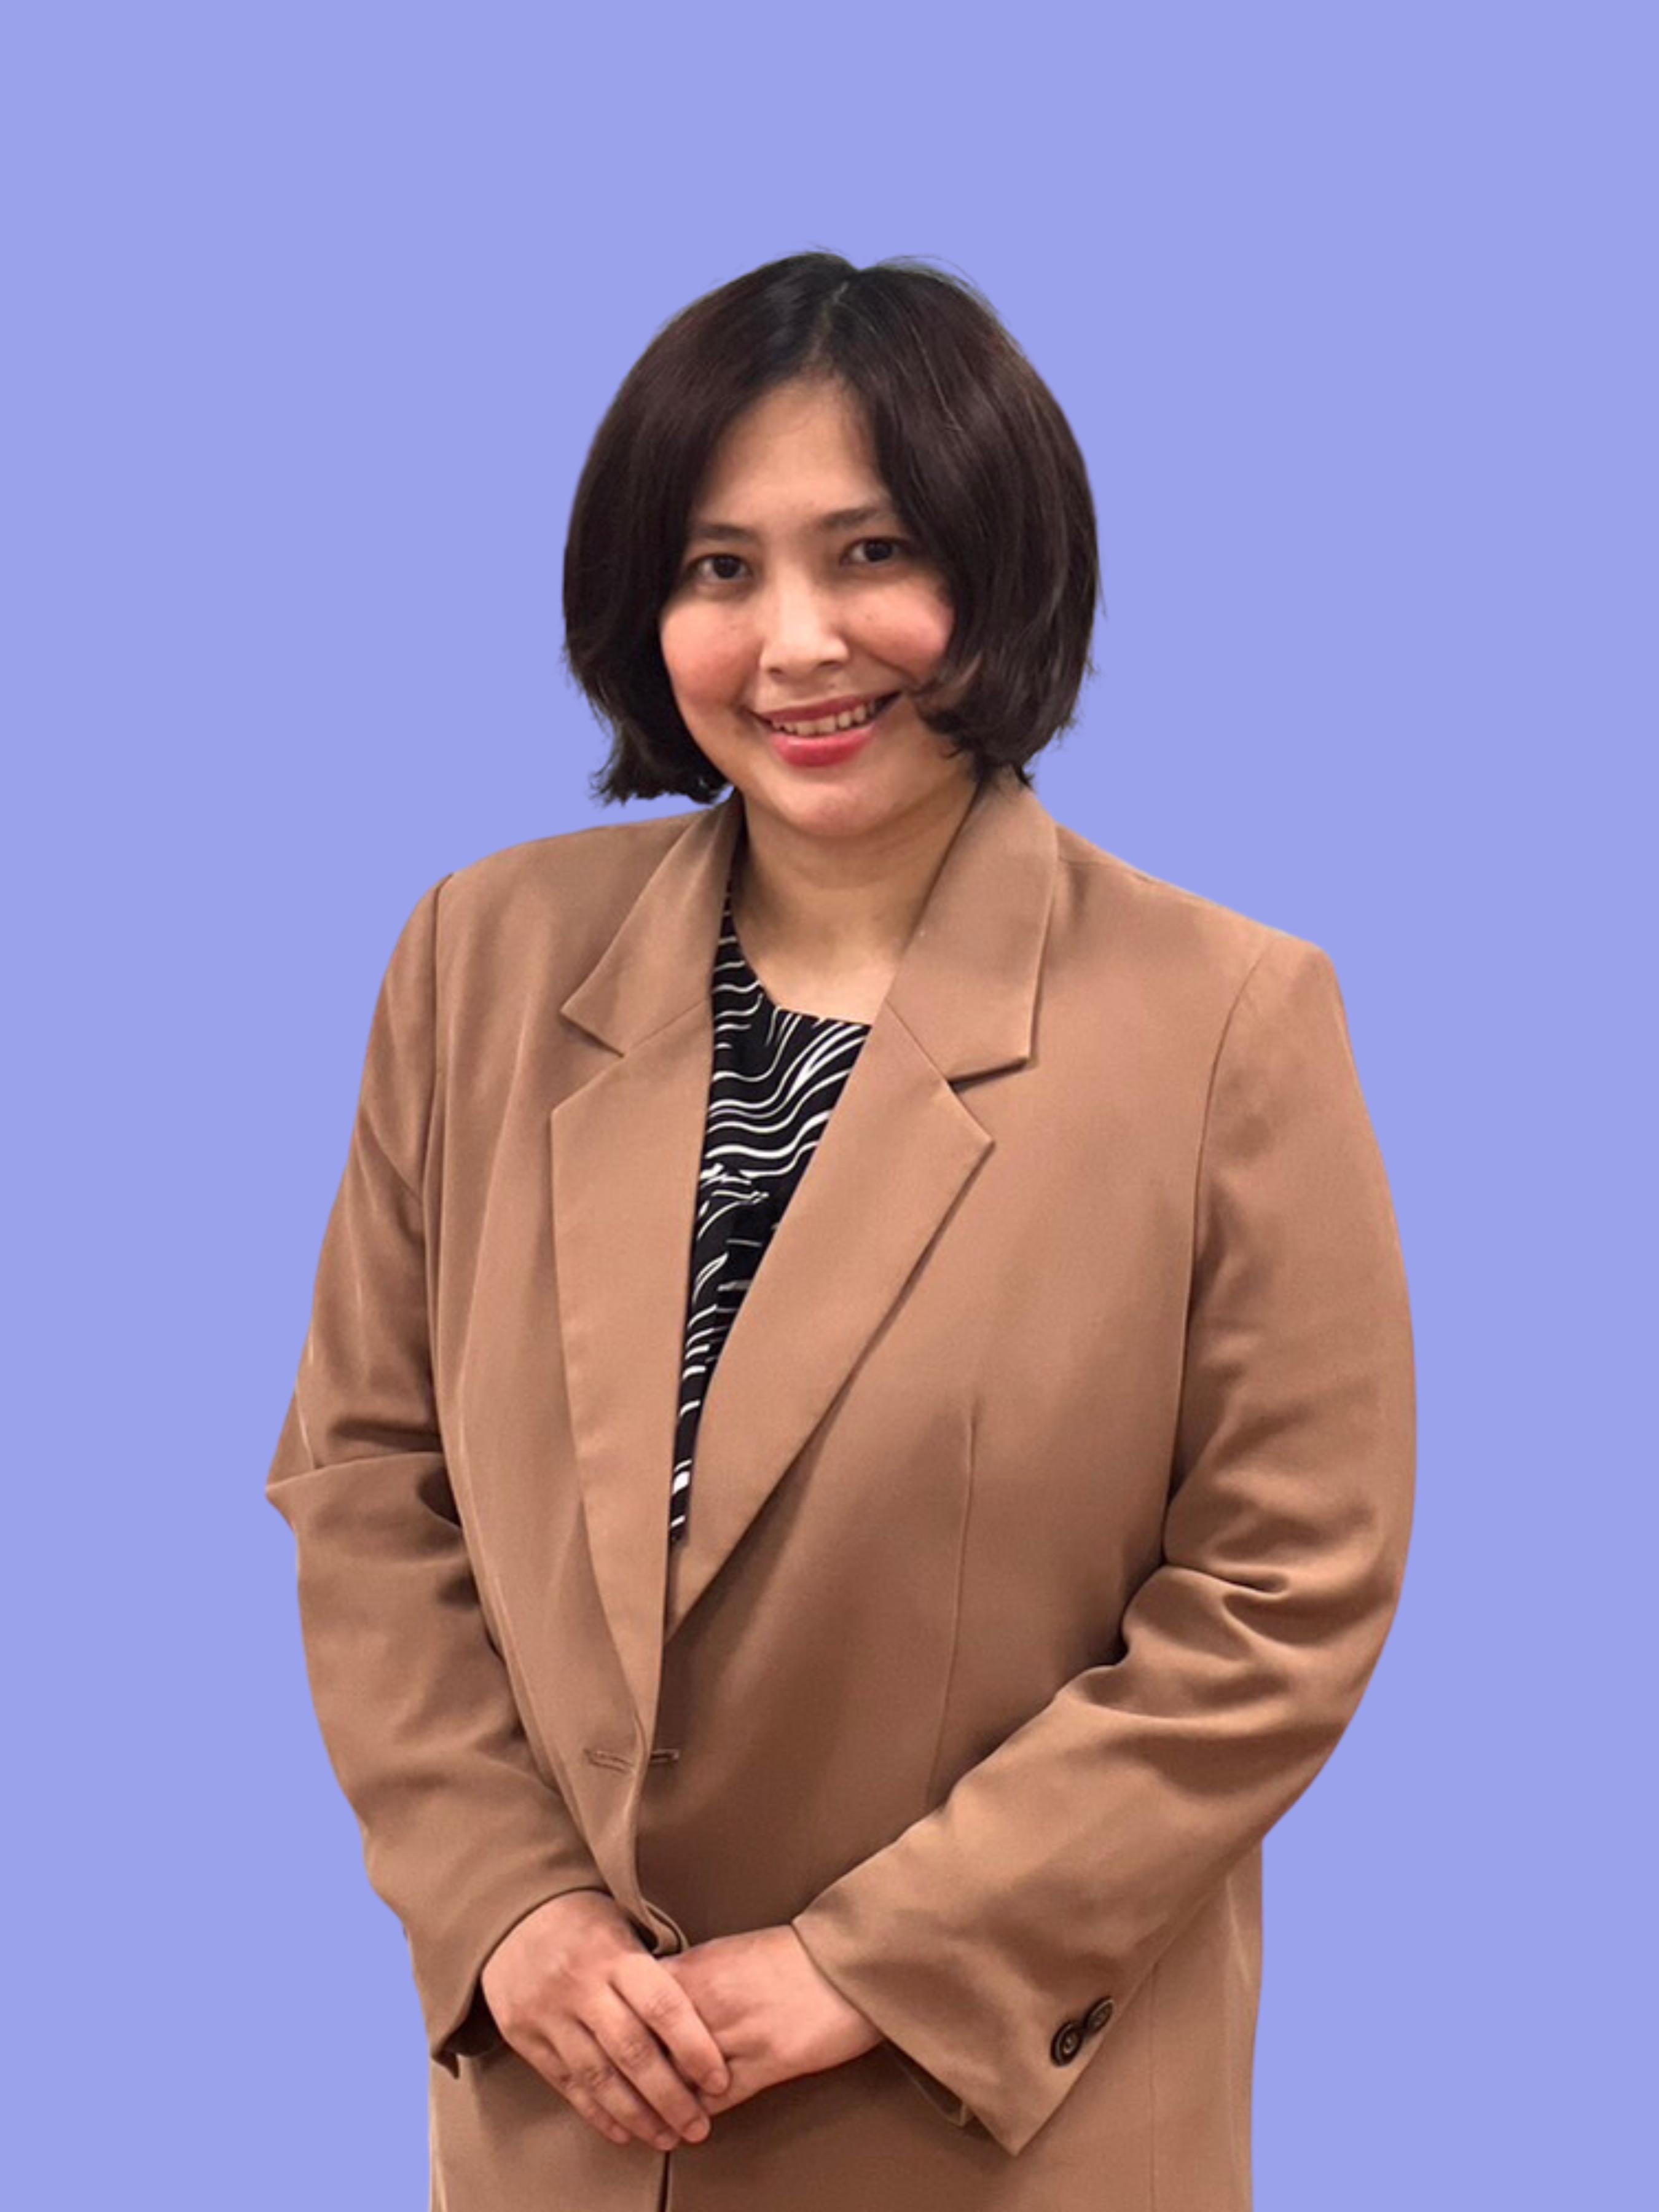 Suthinee Palagawong Na Ayutthaya